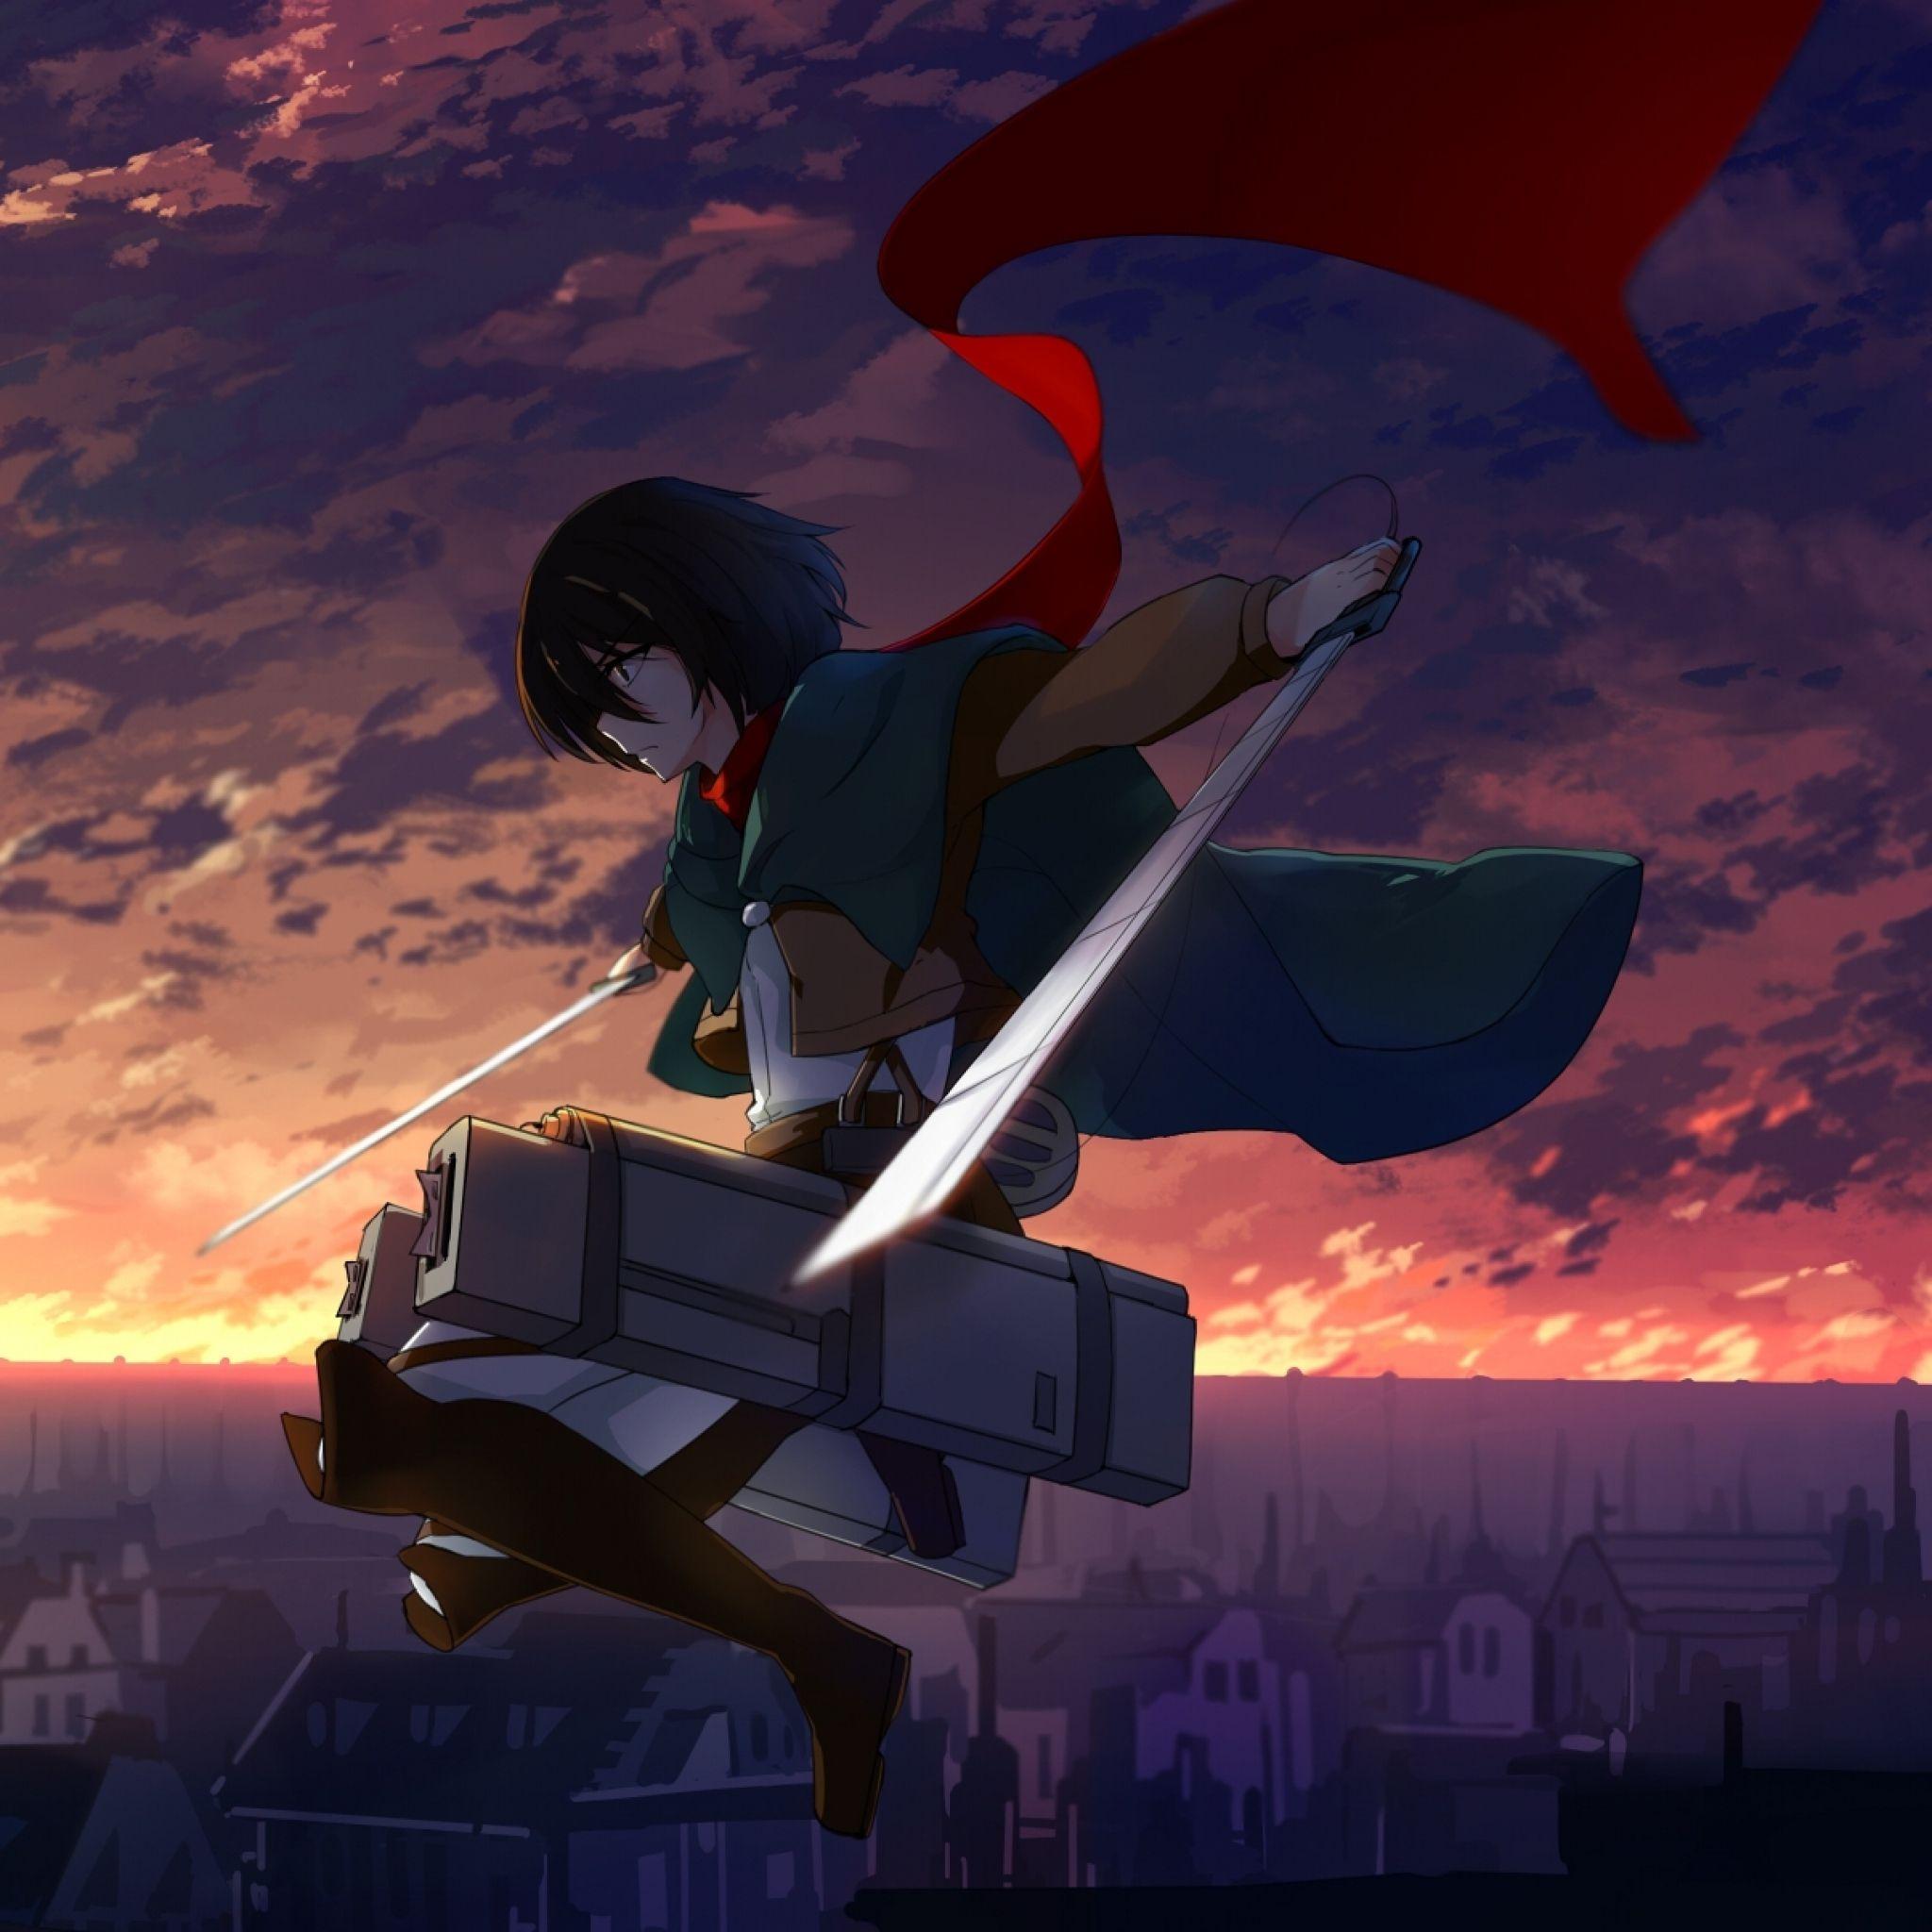 Anime Shingeki No Kyojin Mikasa Ackerman iPad Air